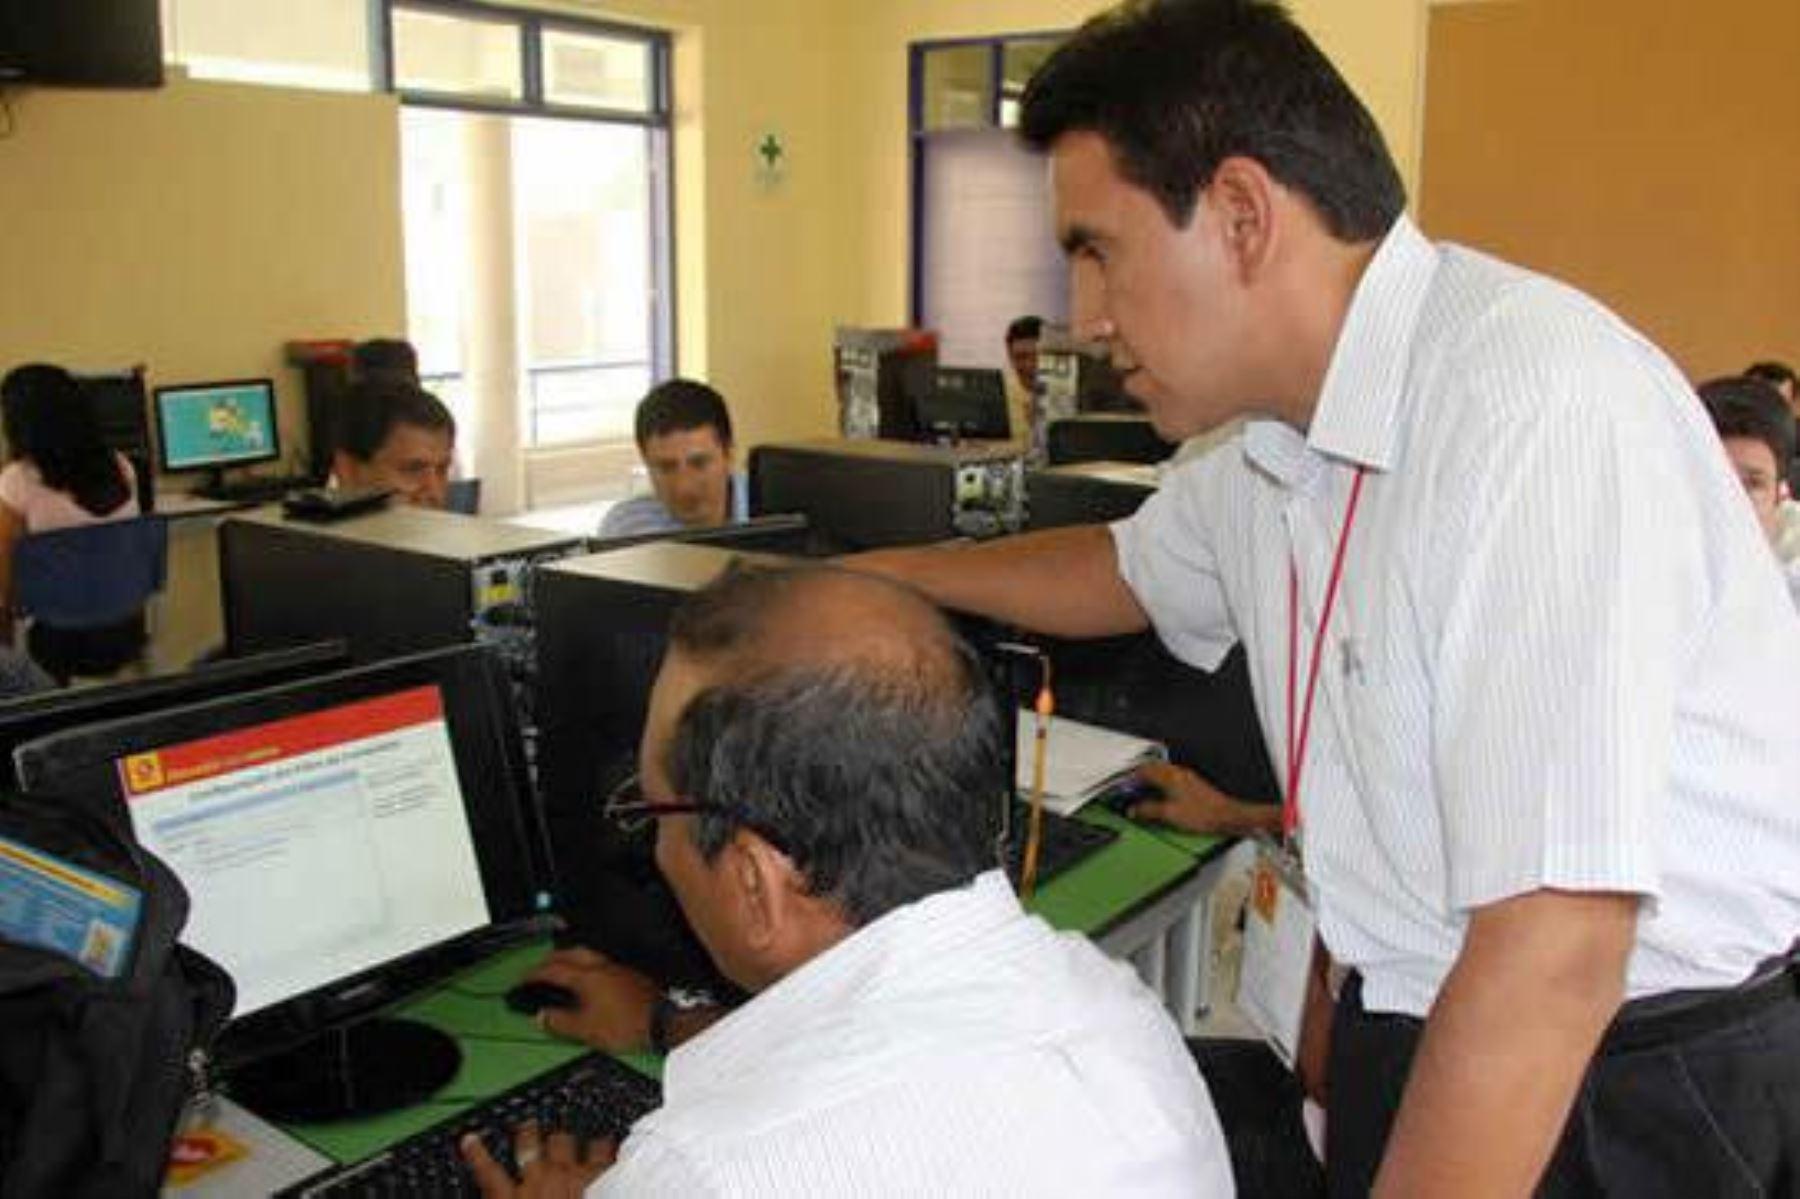 Minedu inicia este lunes ciclo virtual de capacitación docente a nivel nacional. Foto: ANDINA/Difusión.